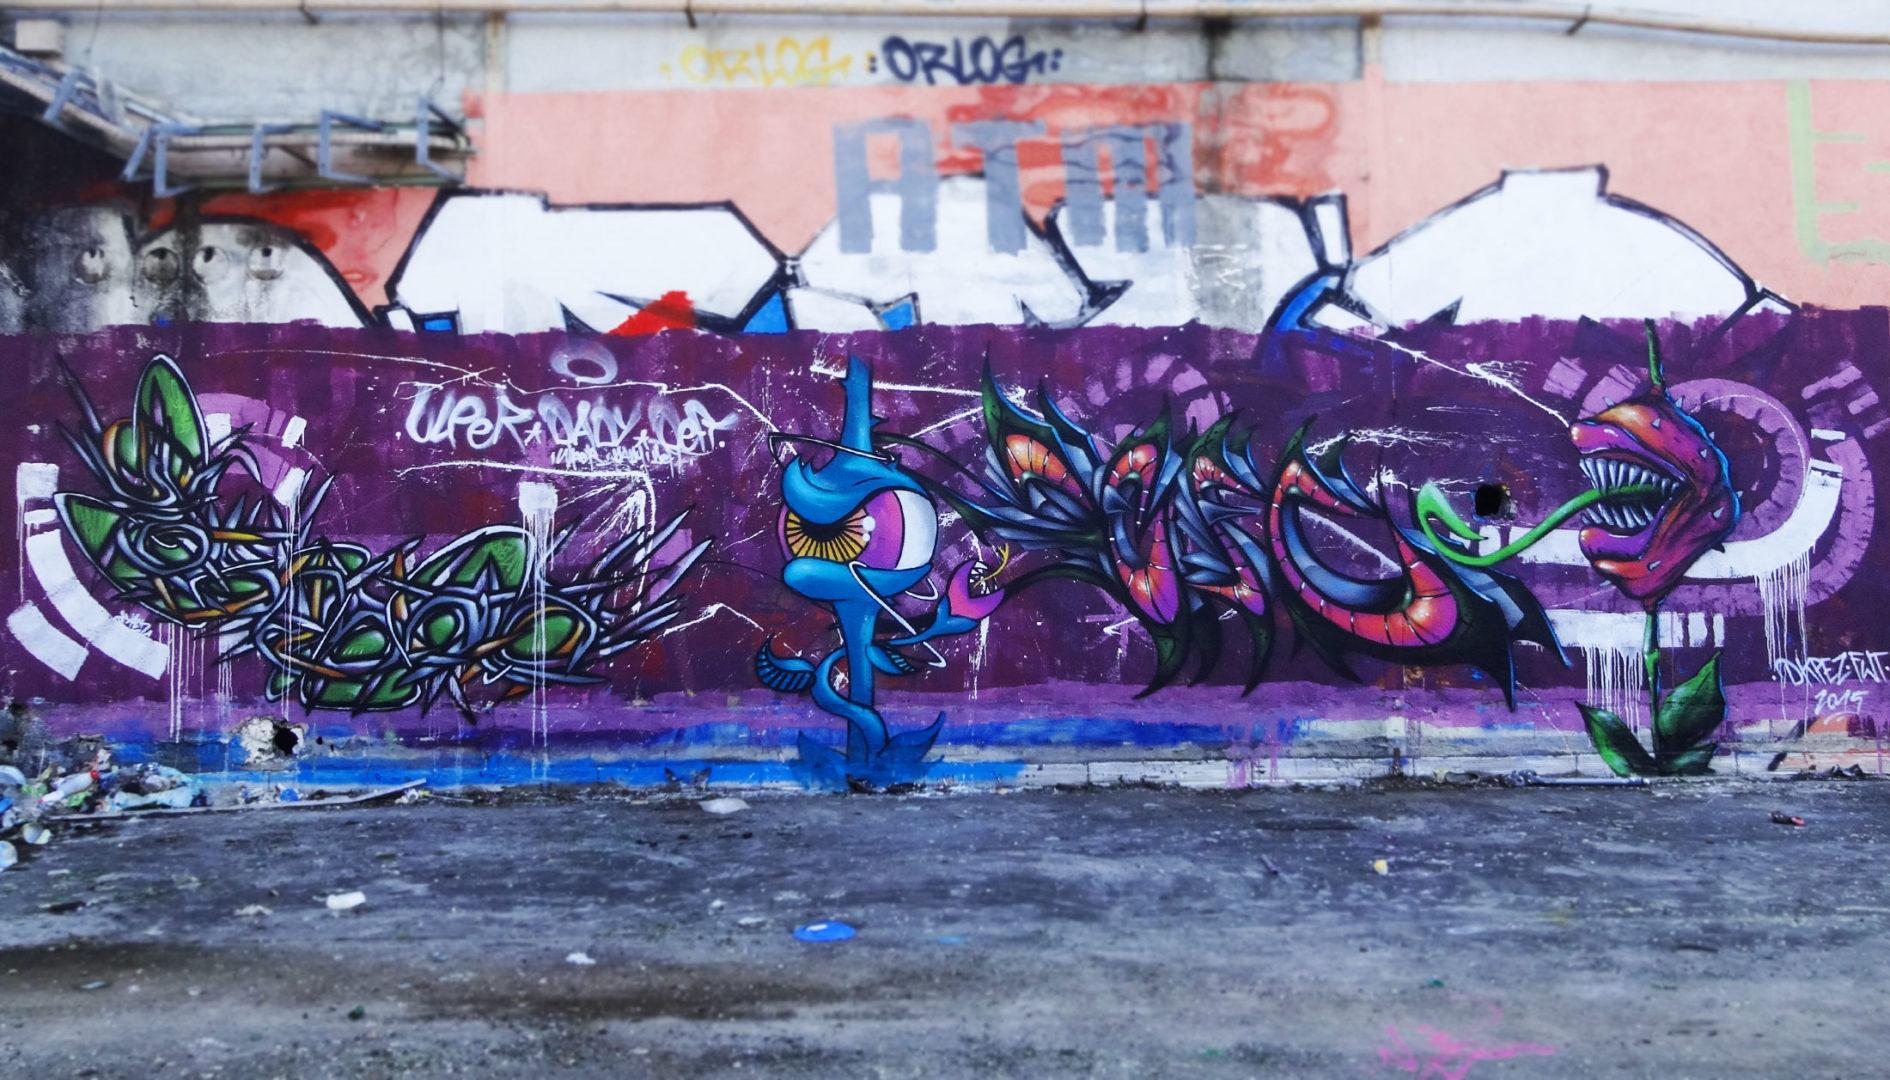 2015_04_deft_graffiti_toulouse_entrepro_ulper_dady_2